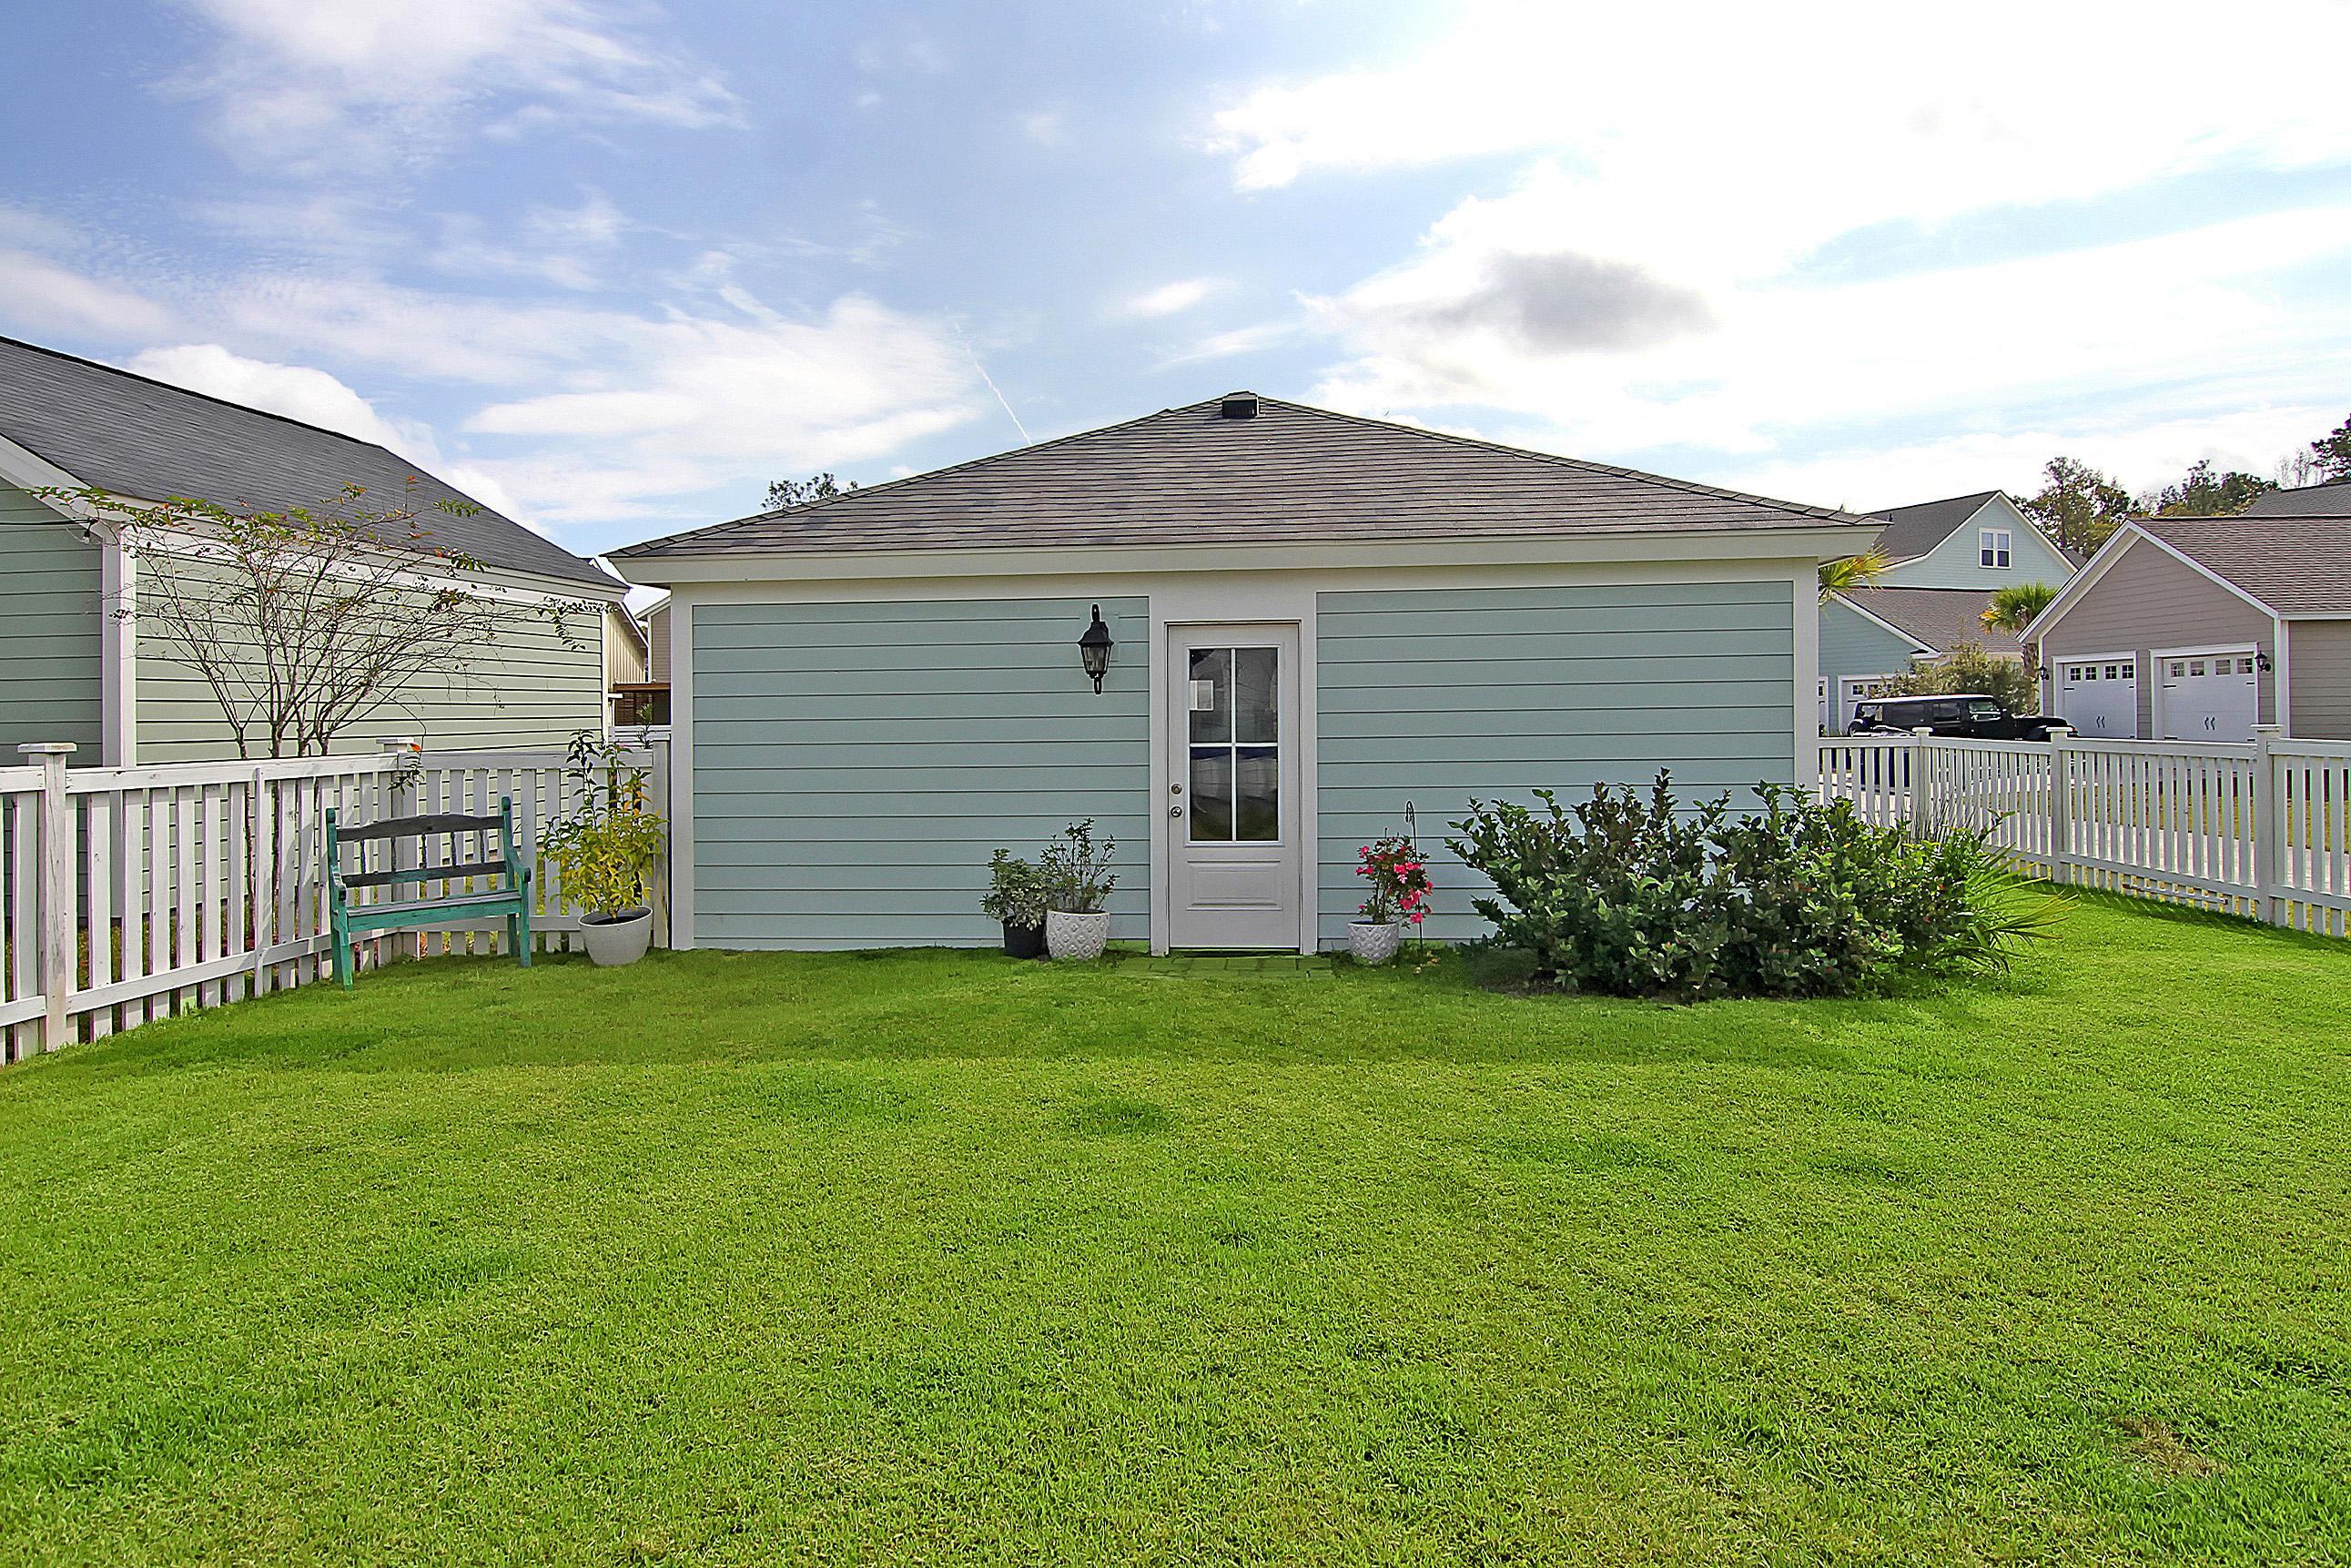 223 Gnarly Oak Lane Summerville, SC 29485